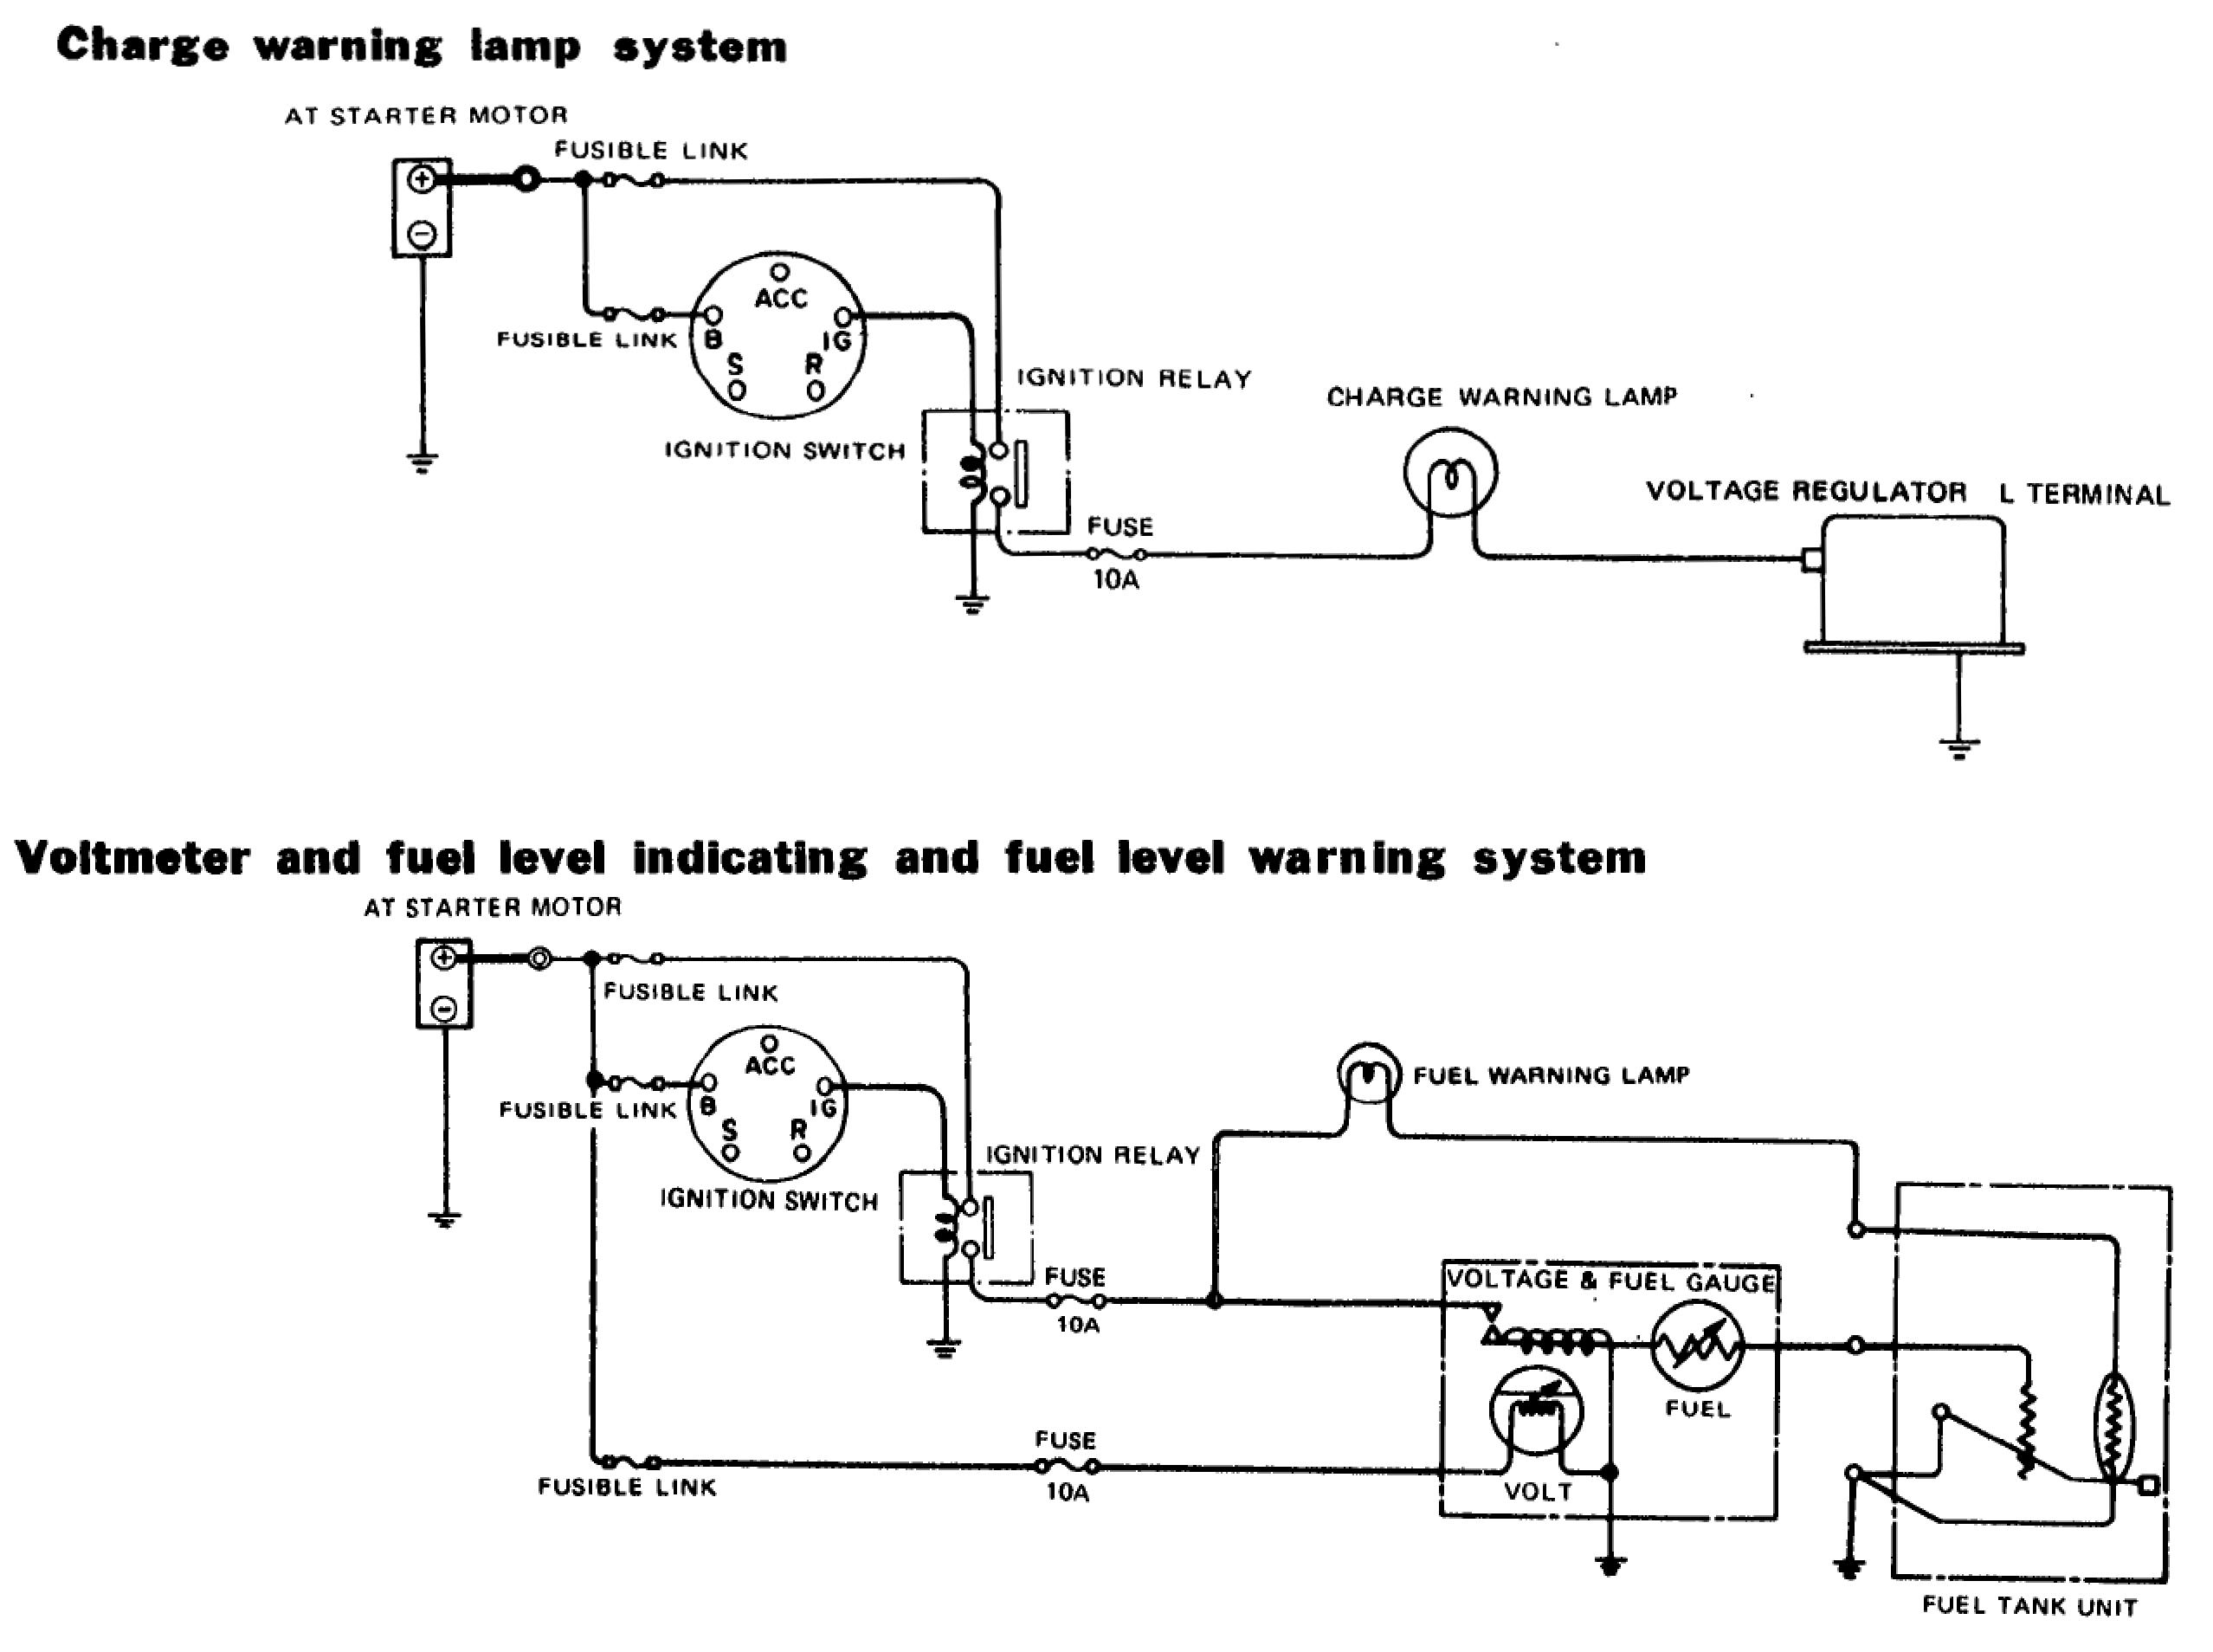 xo_3118] 1982 nissan 280zx alternator wiring diagram together with ...  dupl mopar monoc kicep istic amenti epsy pead favo scoba ...